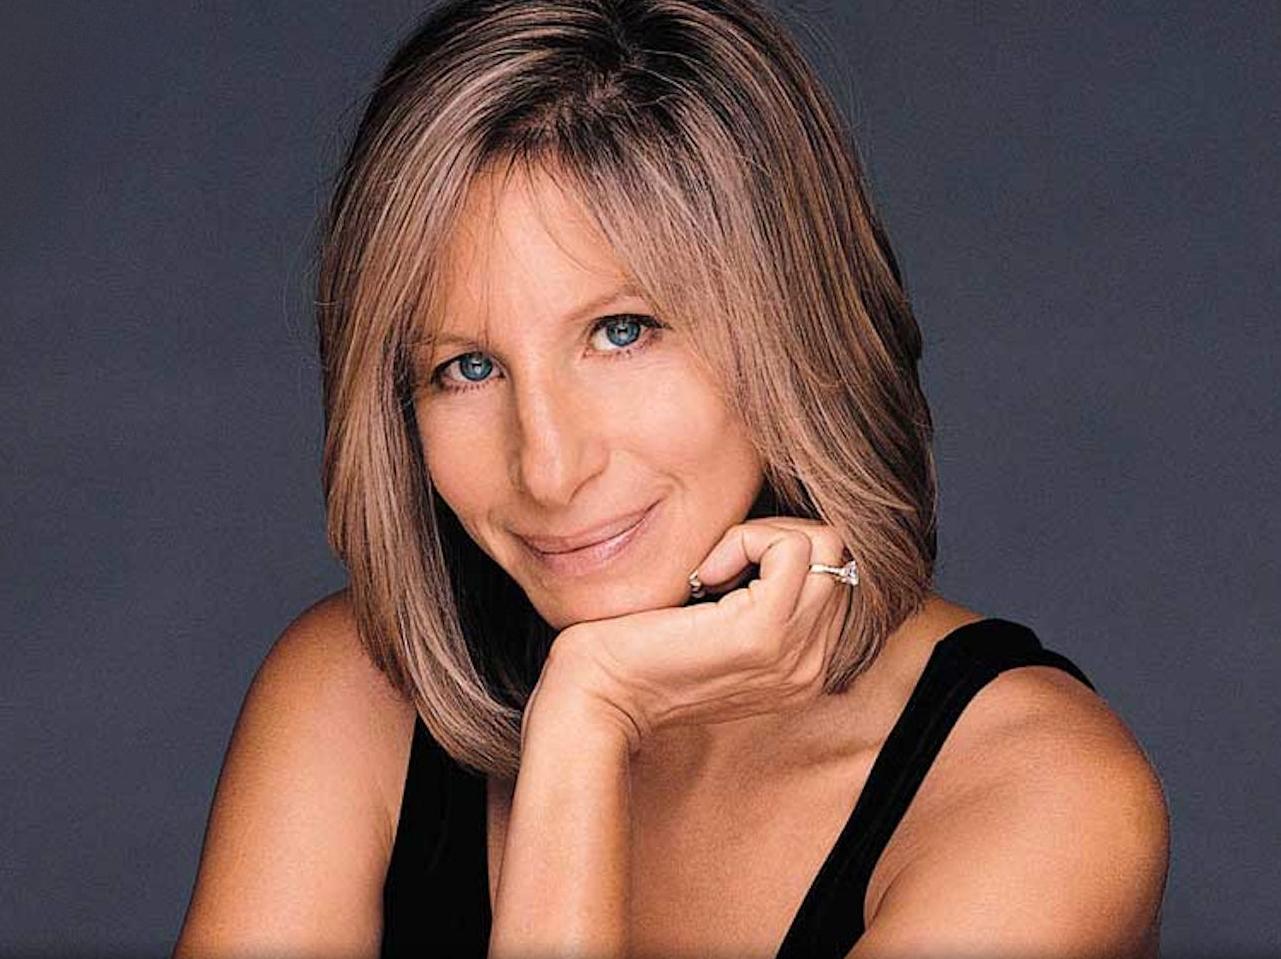 beautiful blonde hairstyles : Barbra Streisand HairStyles (Women HairStyles) - Women Hair Styles ...